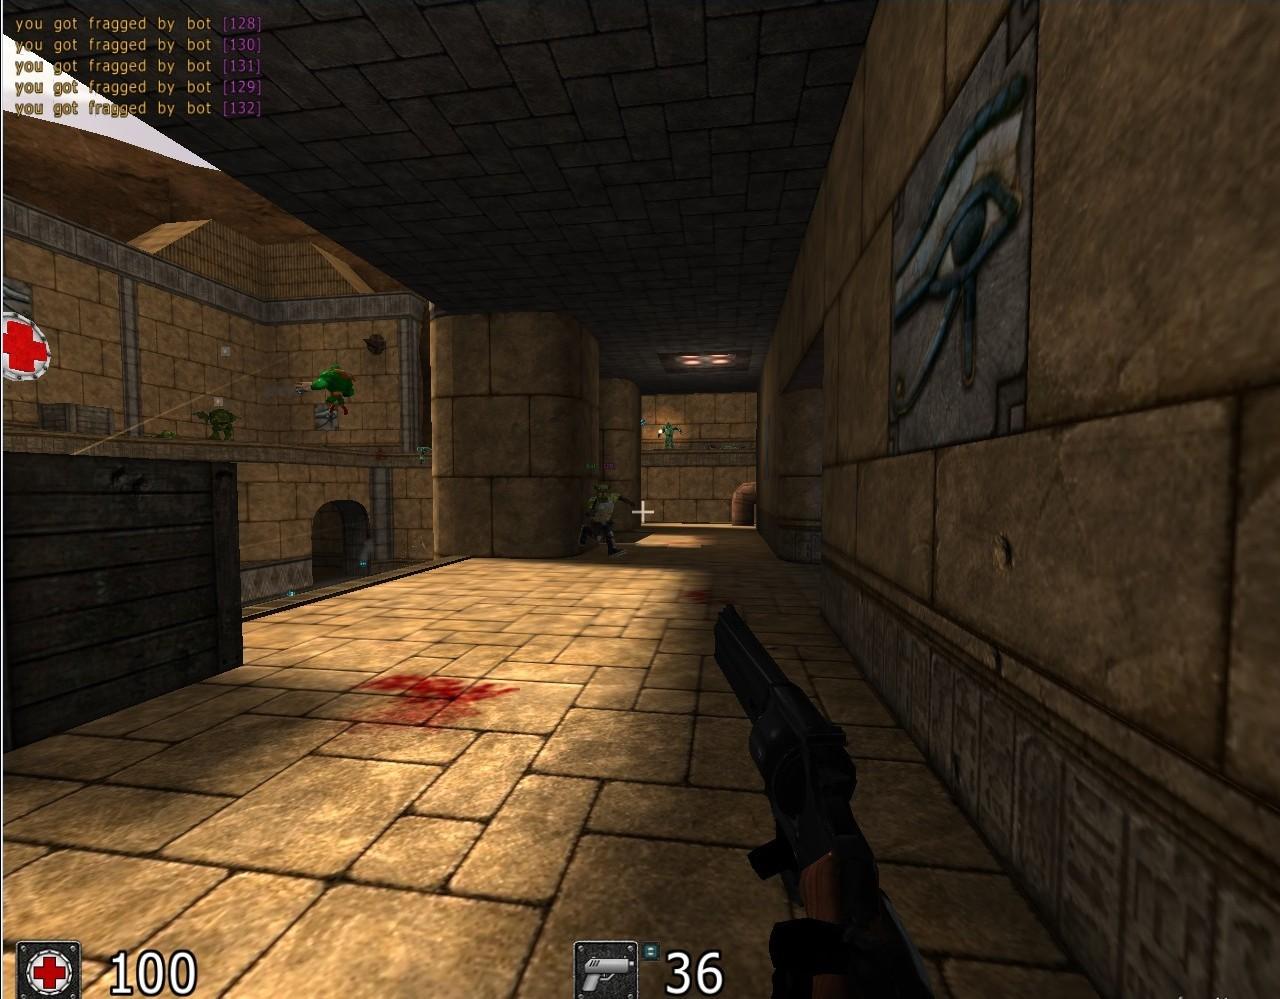 Screenshot 1 - Cube 2: Sauerbraten (Mac)